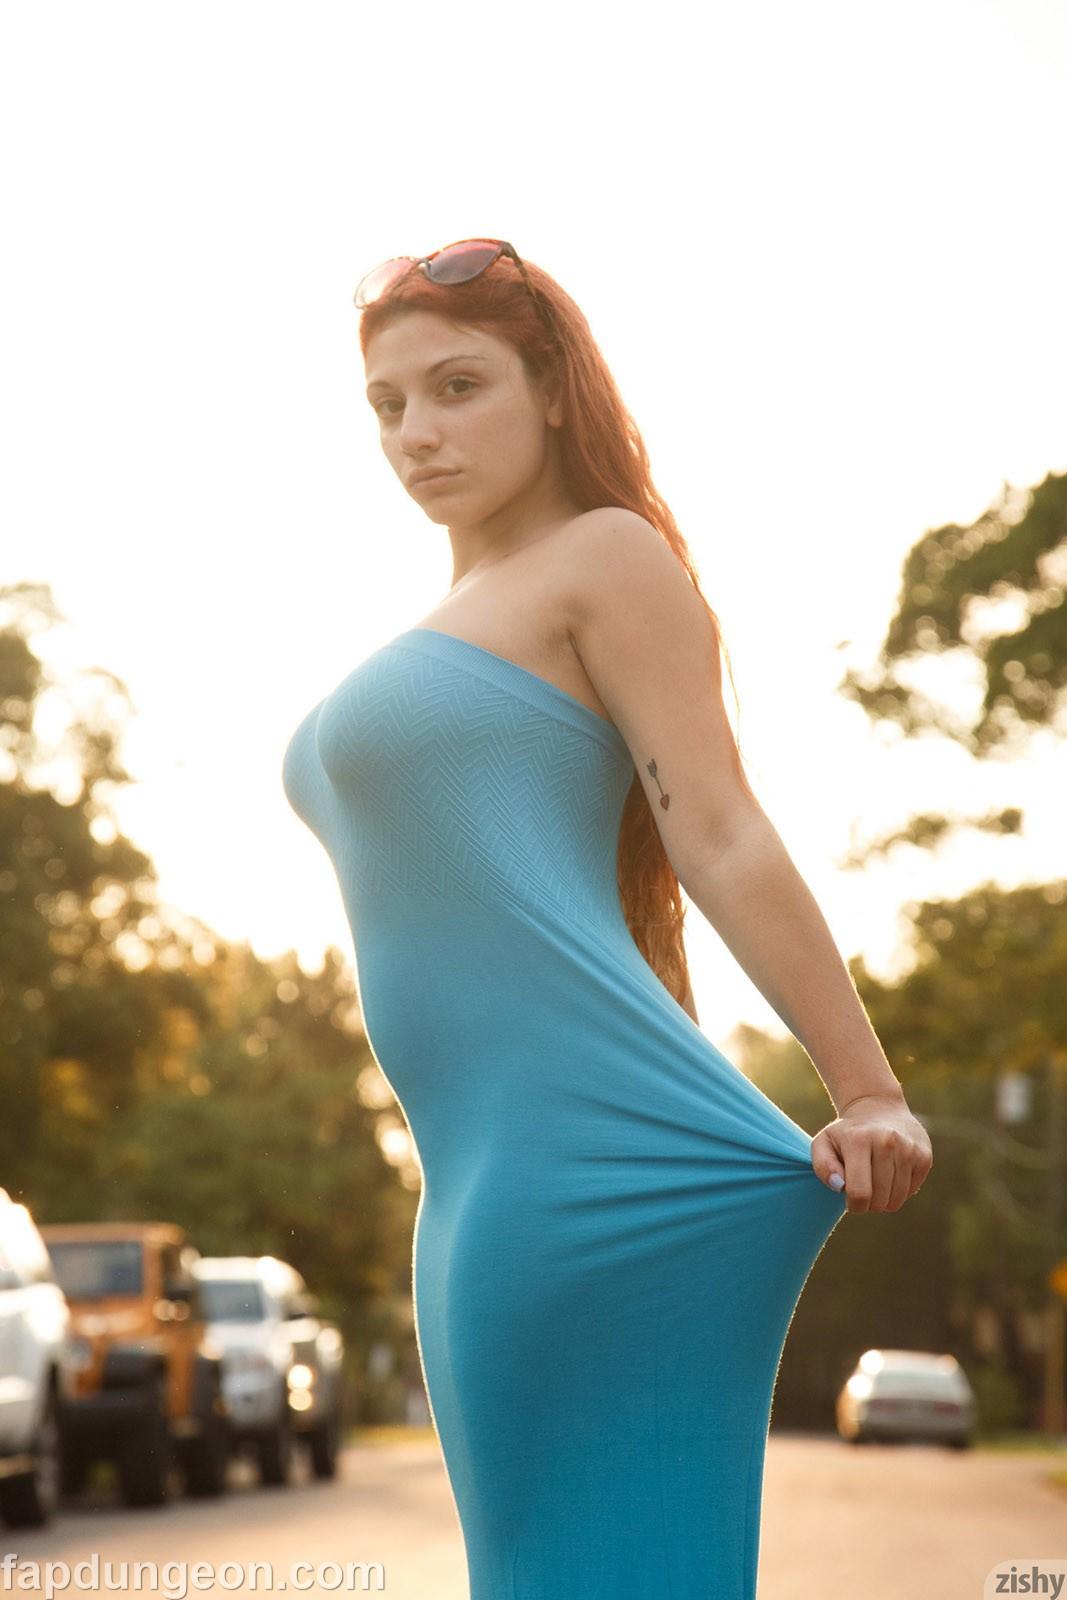 Gina Rosini - Busty Nextdoor Redheads Nudes - Page 3 of 3